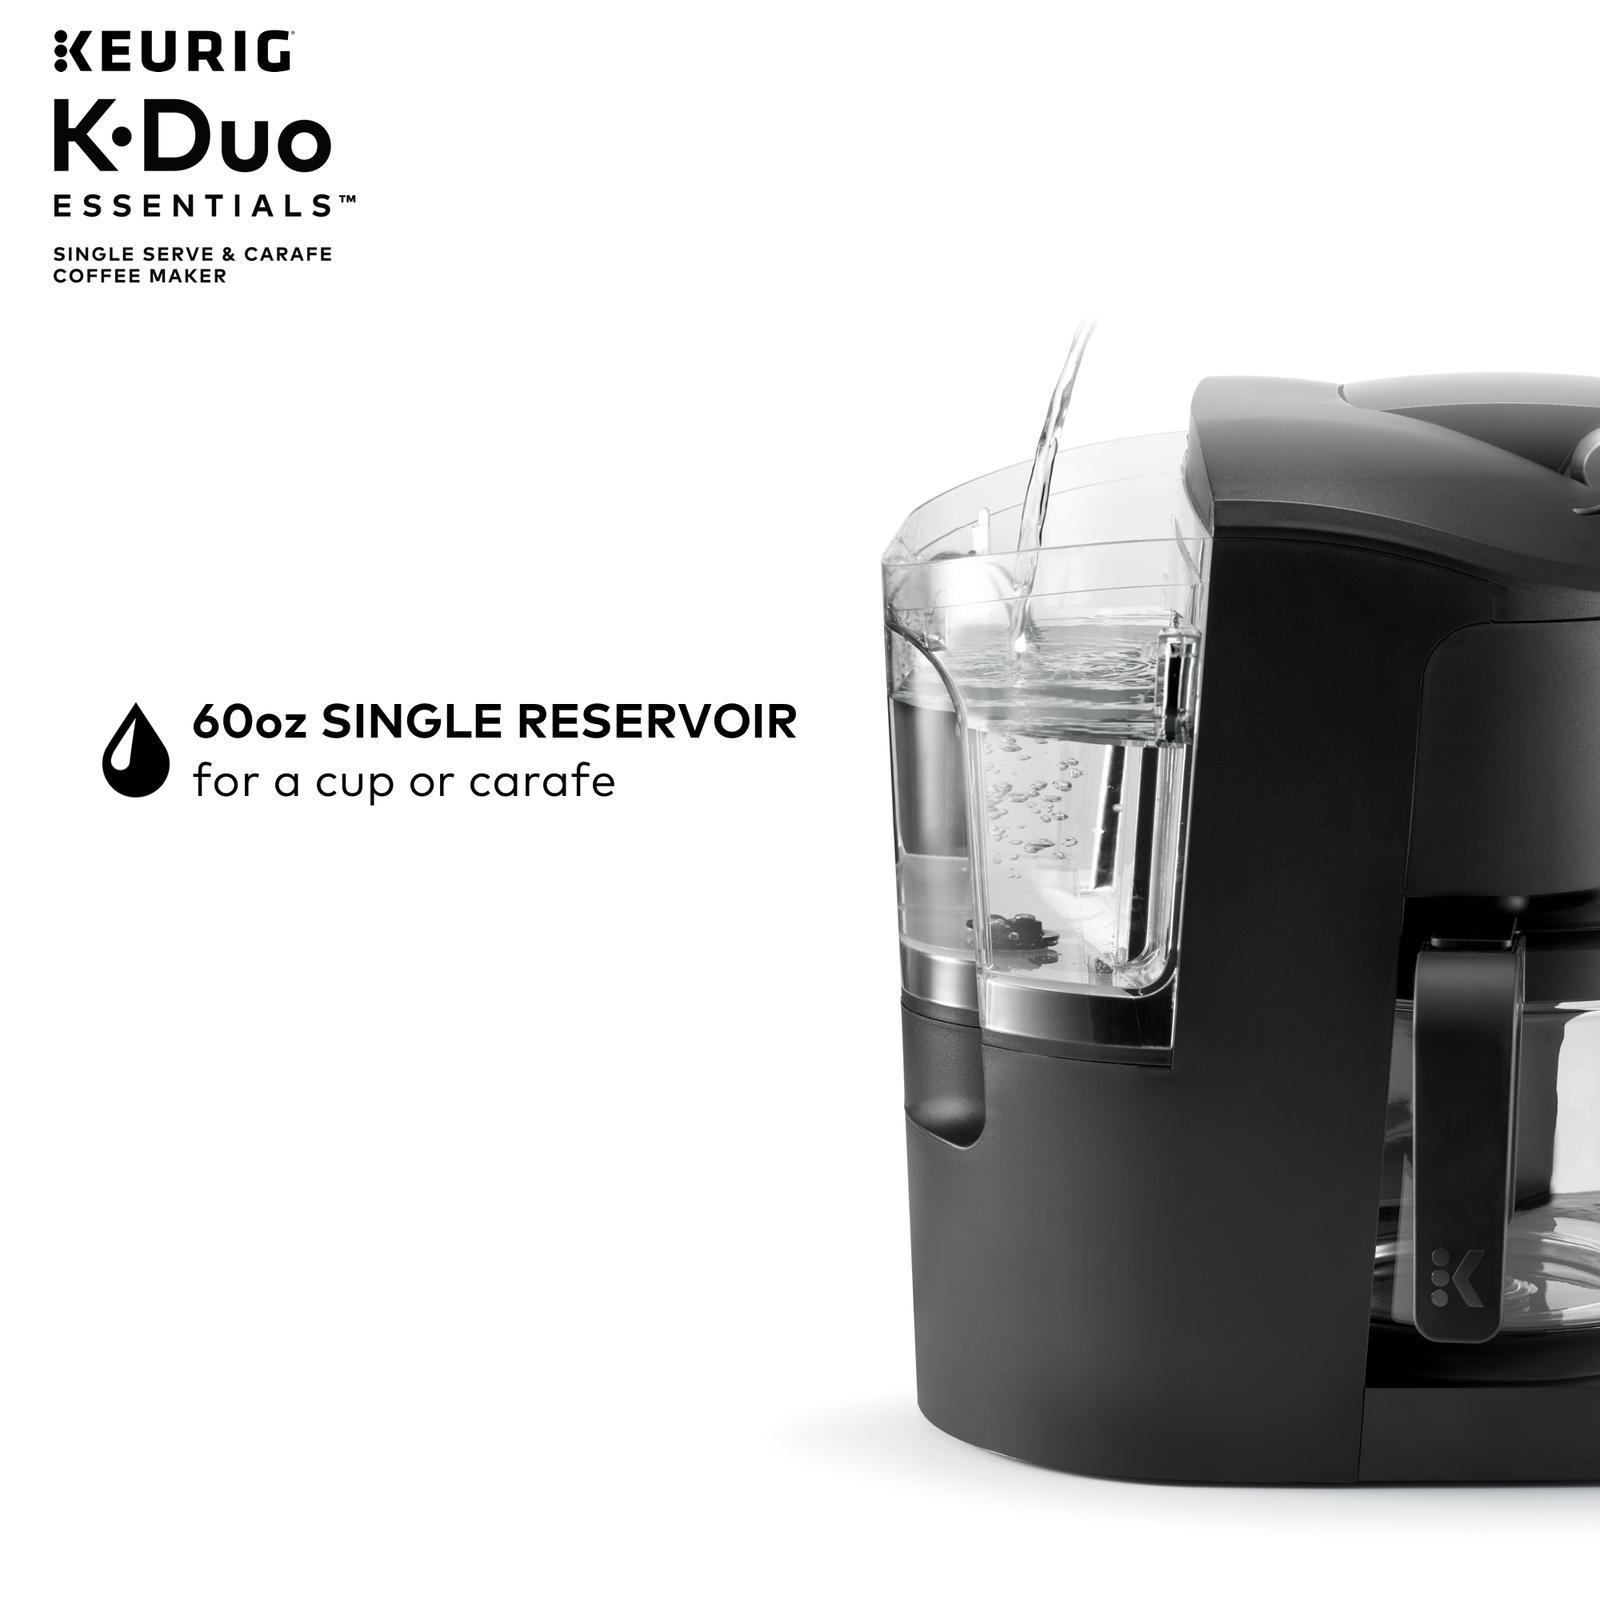 Keurig K-Duo Essentials Coffee Maker, with Single Serve K ...